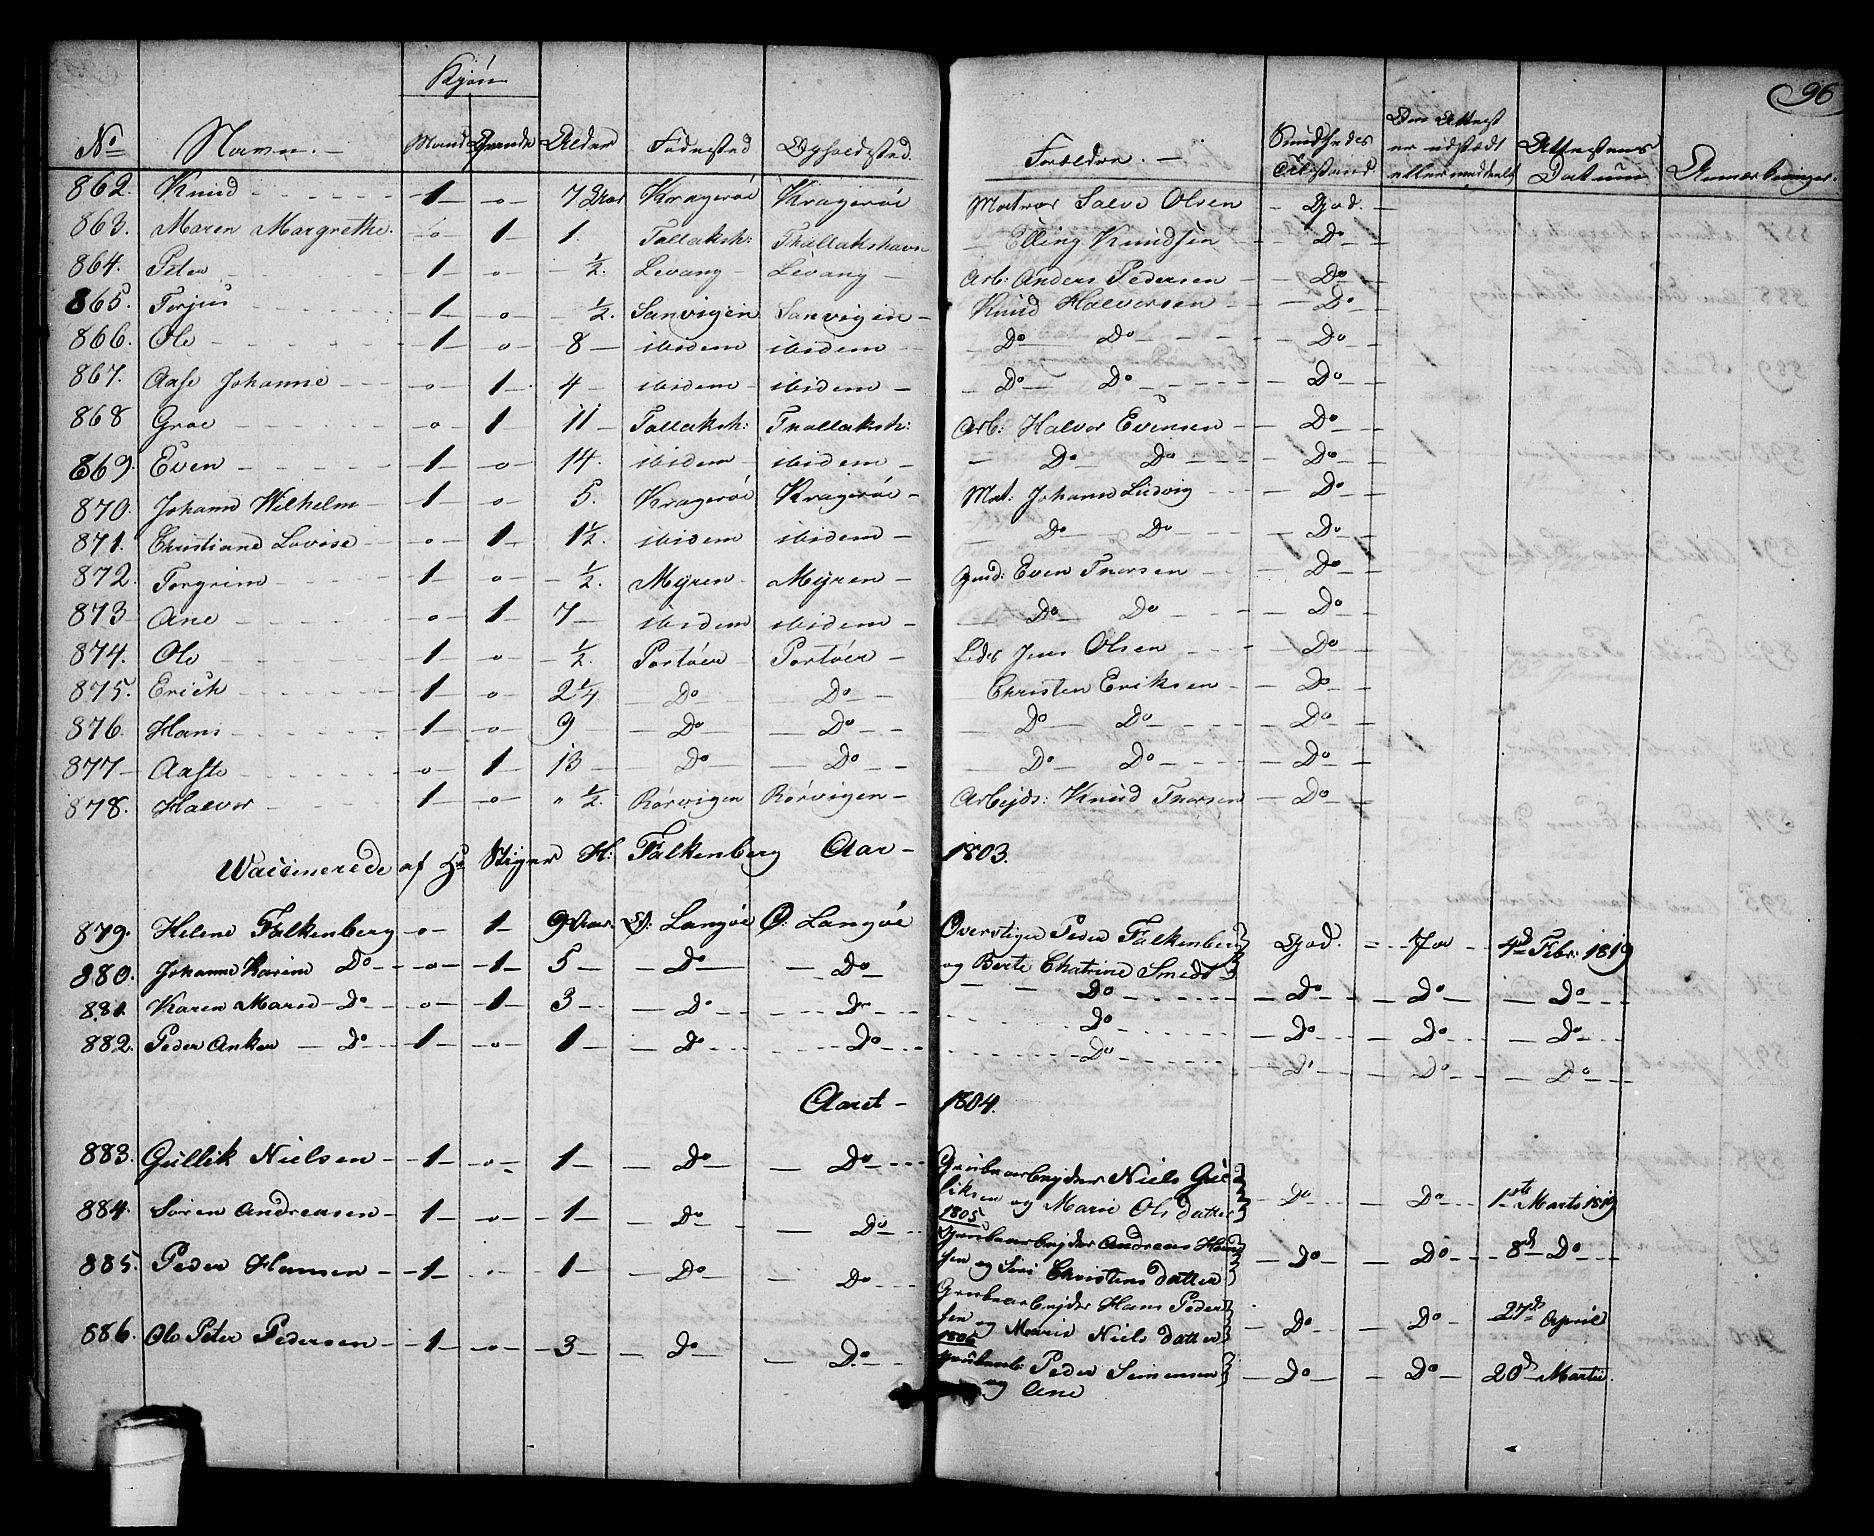 SAKO, Kragerø kirkebøker, F/Fa/L0003: Ministerialbok nr. 3, 1802-1813, s. 96